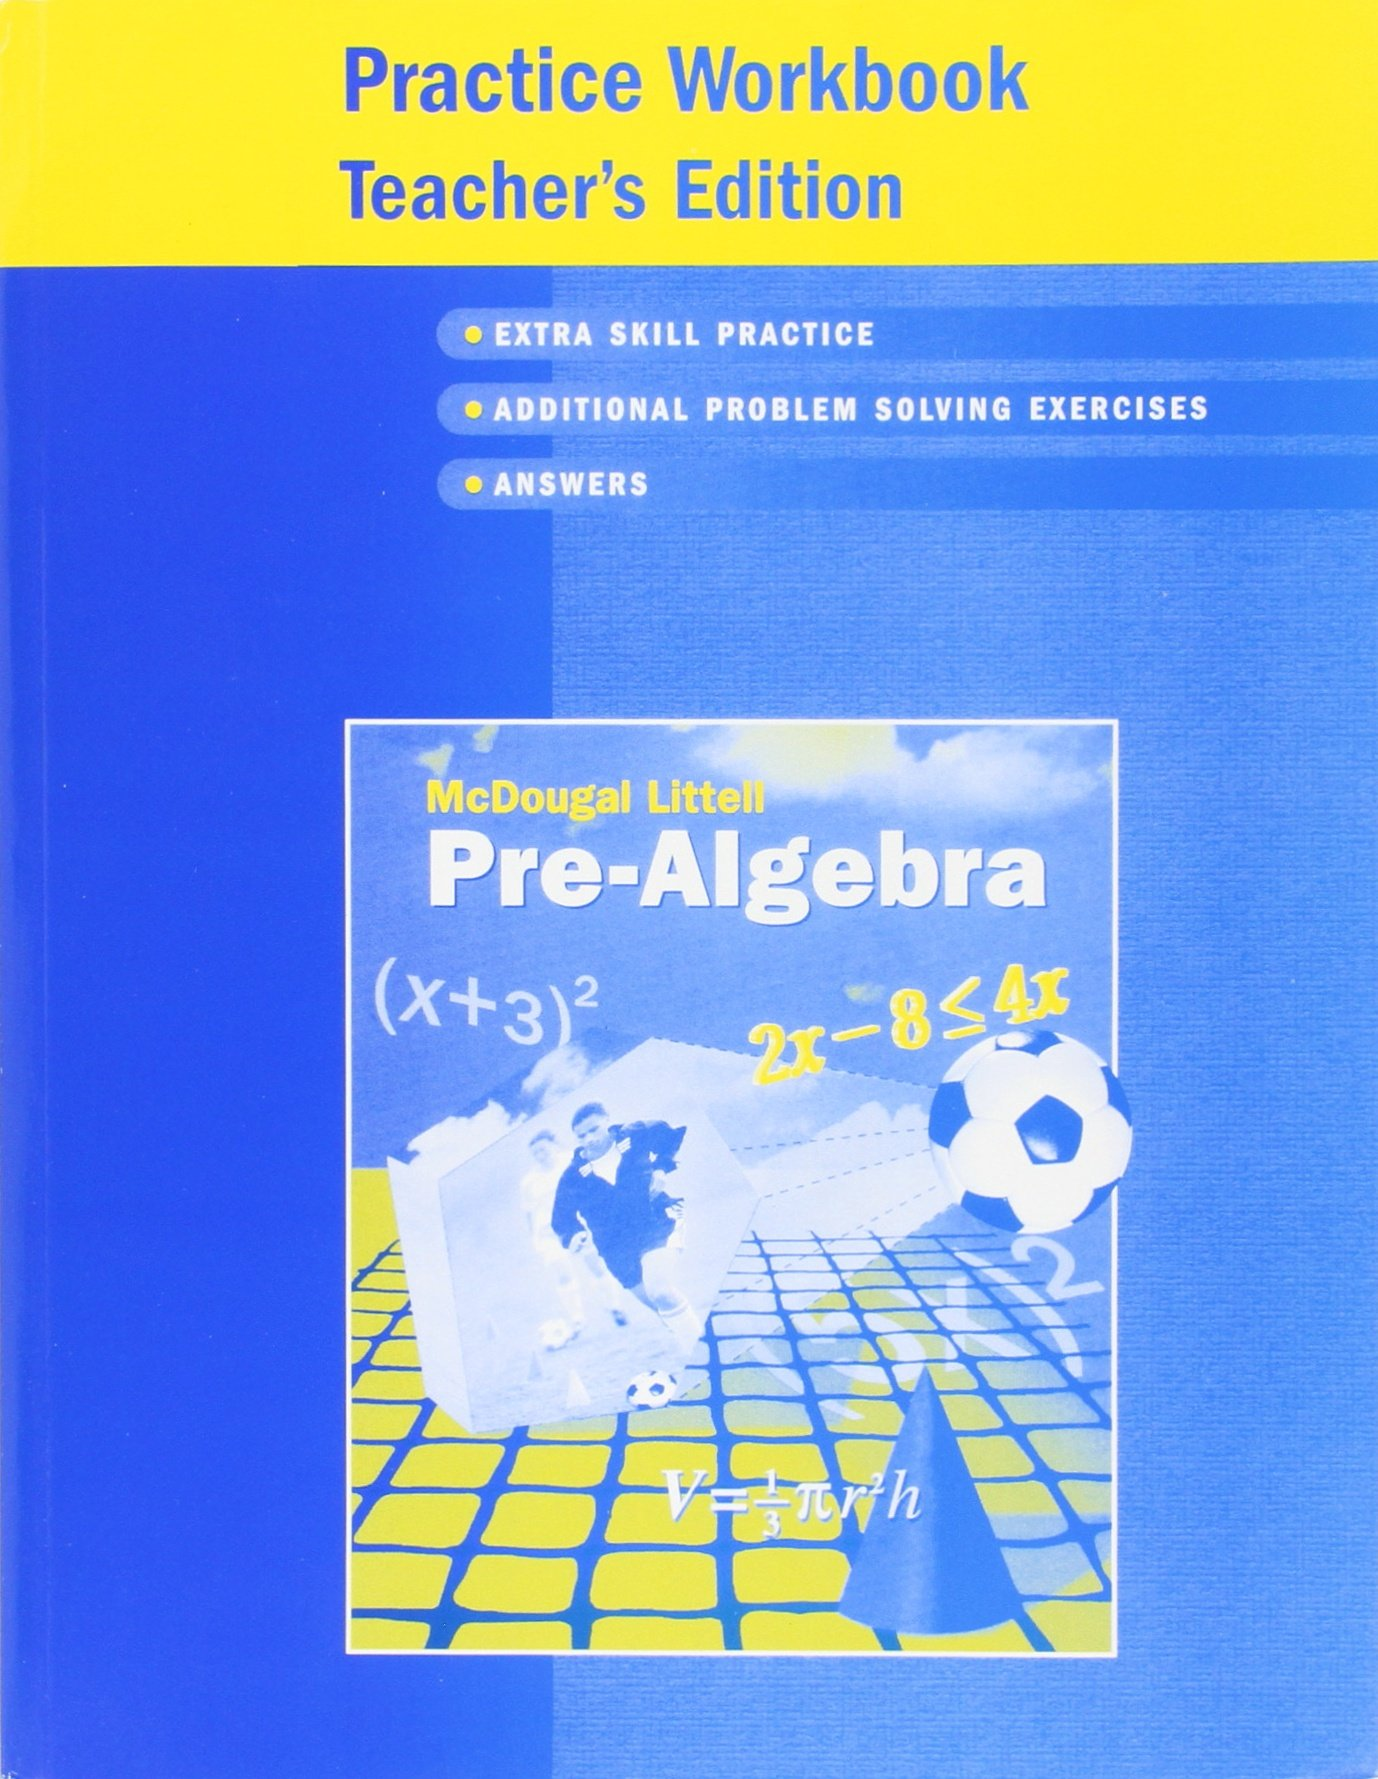 Amazon.com: Pre-Algebra Practice Workbook Teacher's Edition  (9780618343638): MCDOUGAL LITTEL: Books